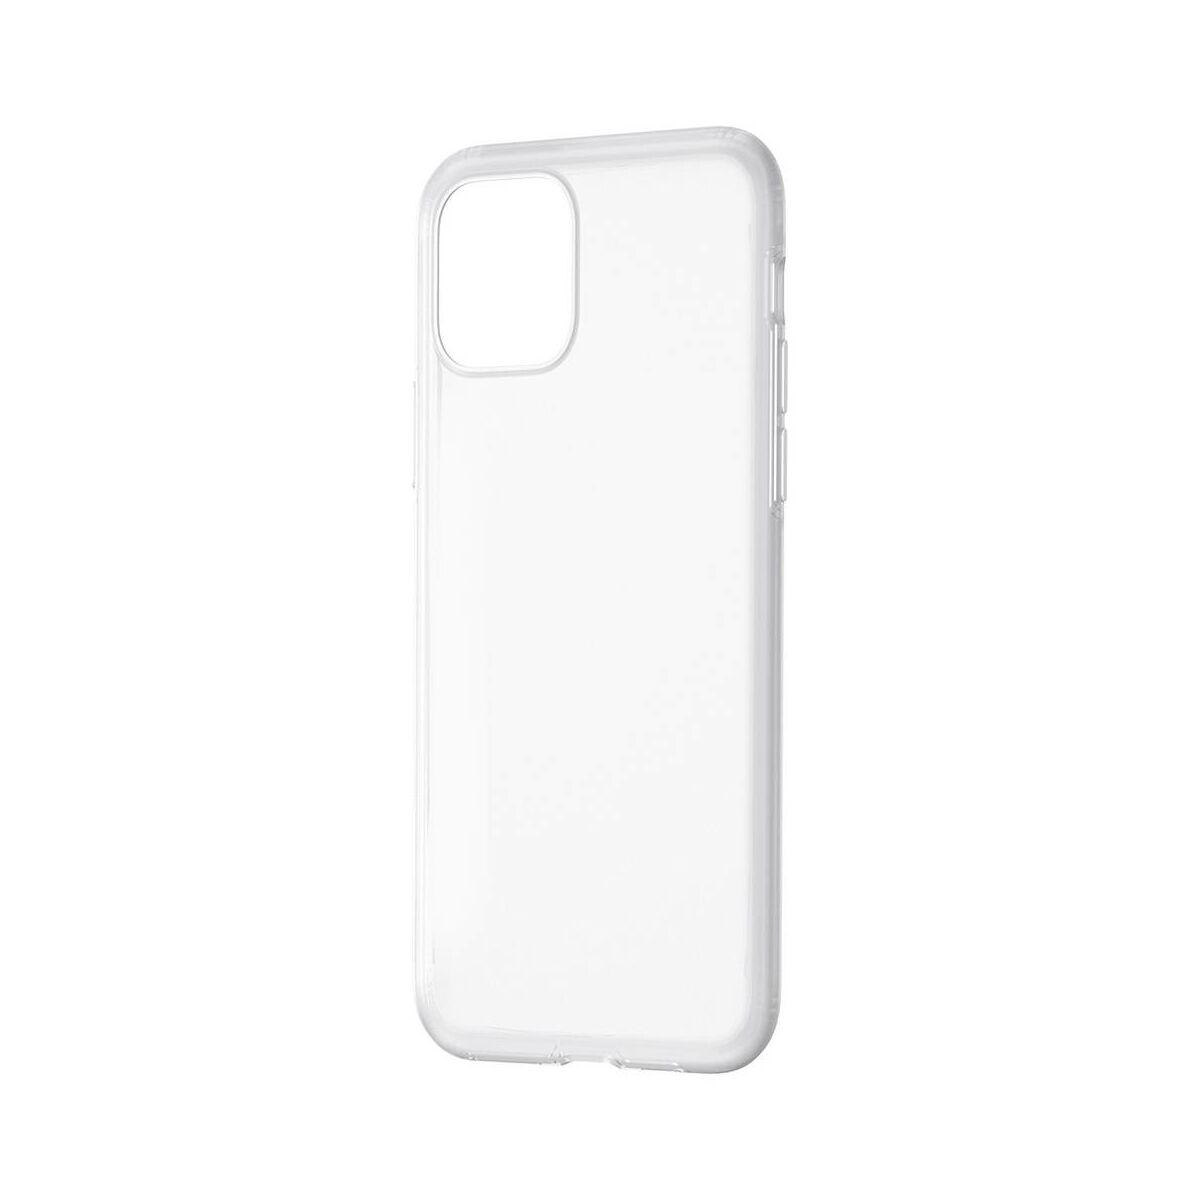 Baseus iPhone 11 Pro tok, Jelly Liquid Silica Gel Protective tok, átlátszó fehér (WIAPIPH58S-GD02